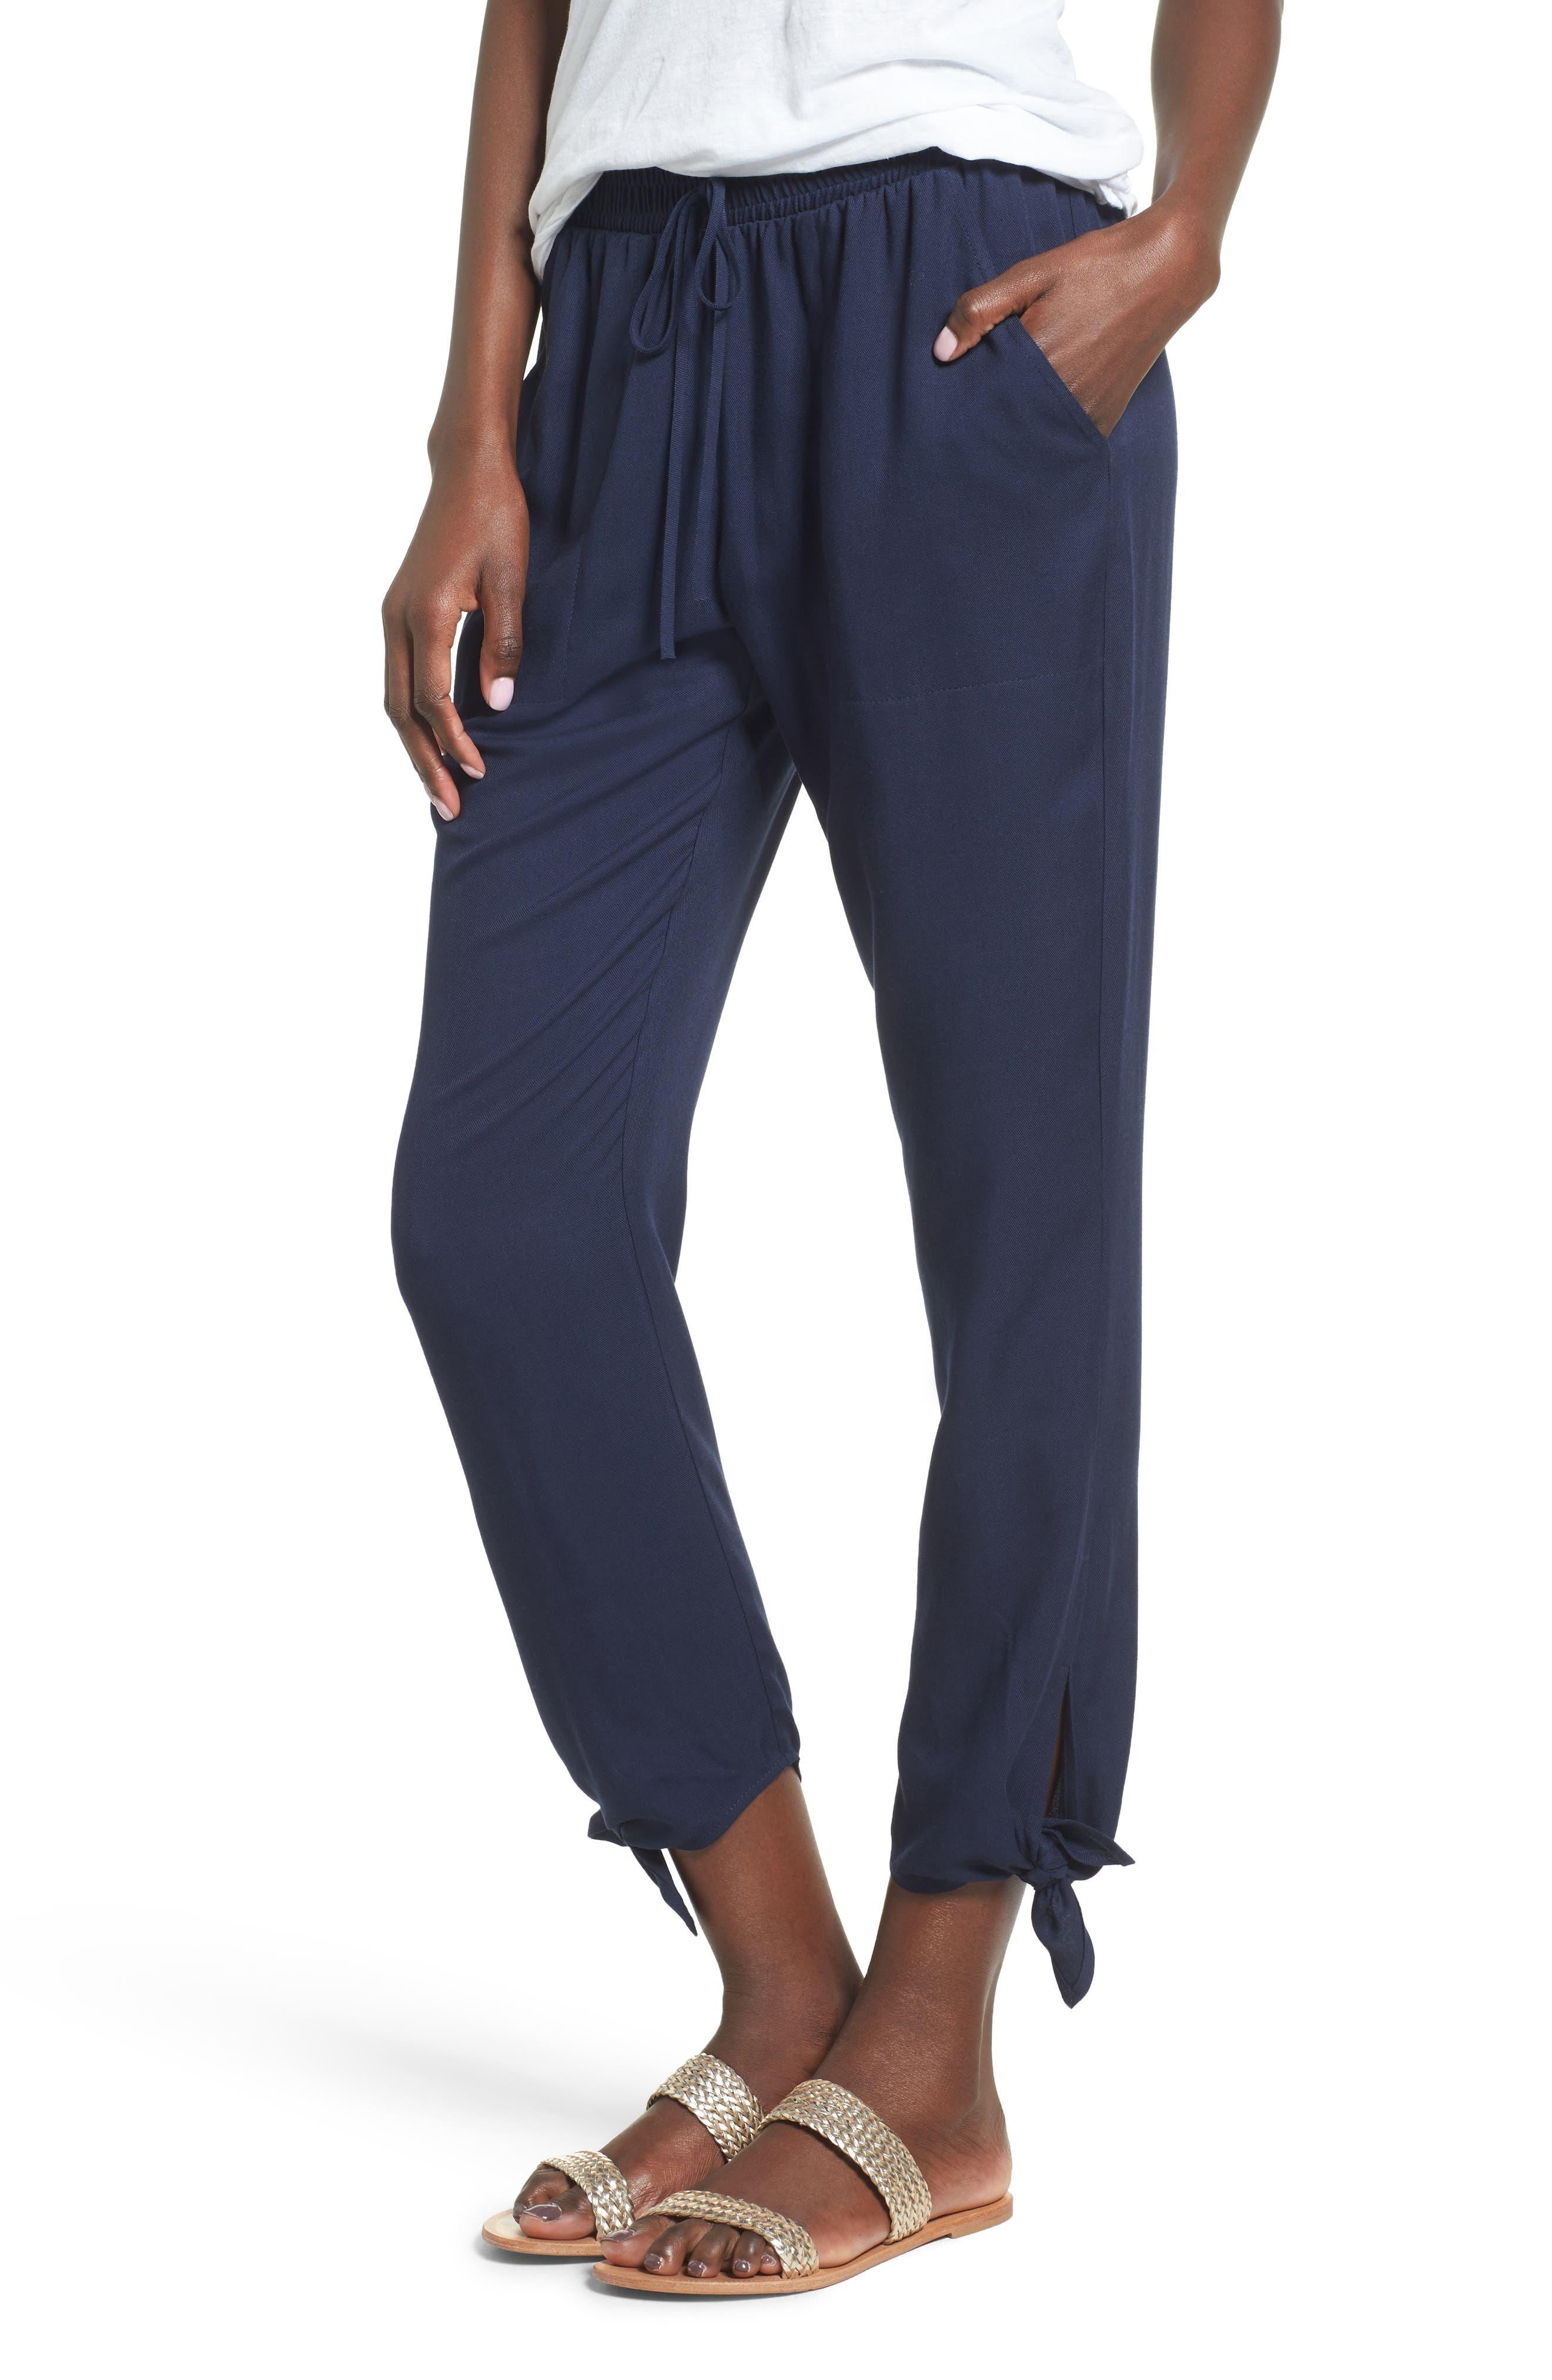 Main Image - Socialite Ankle Tie Pants